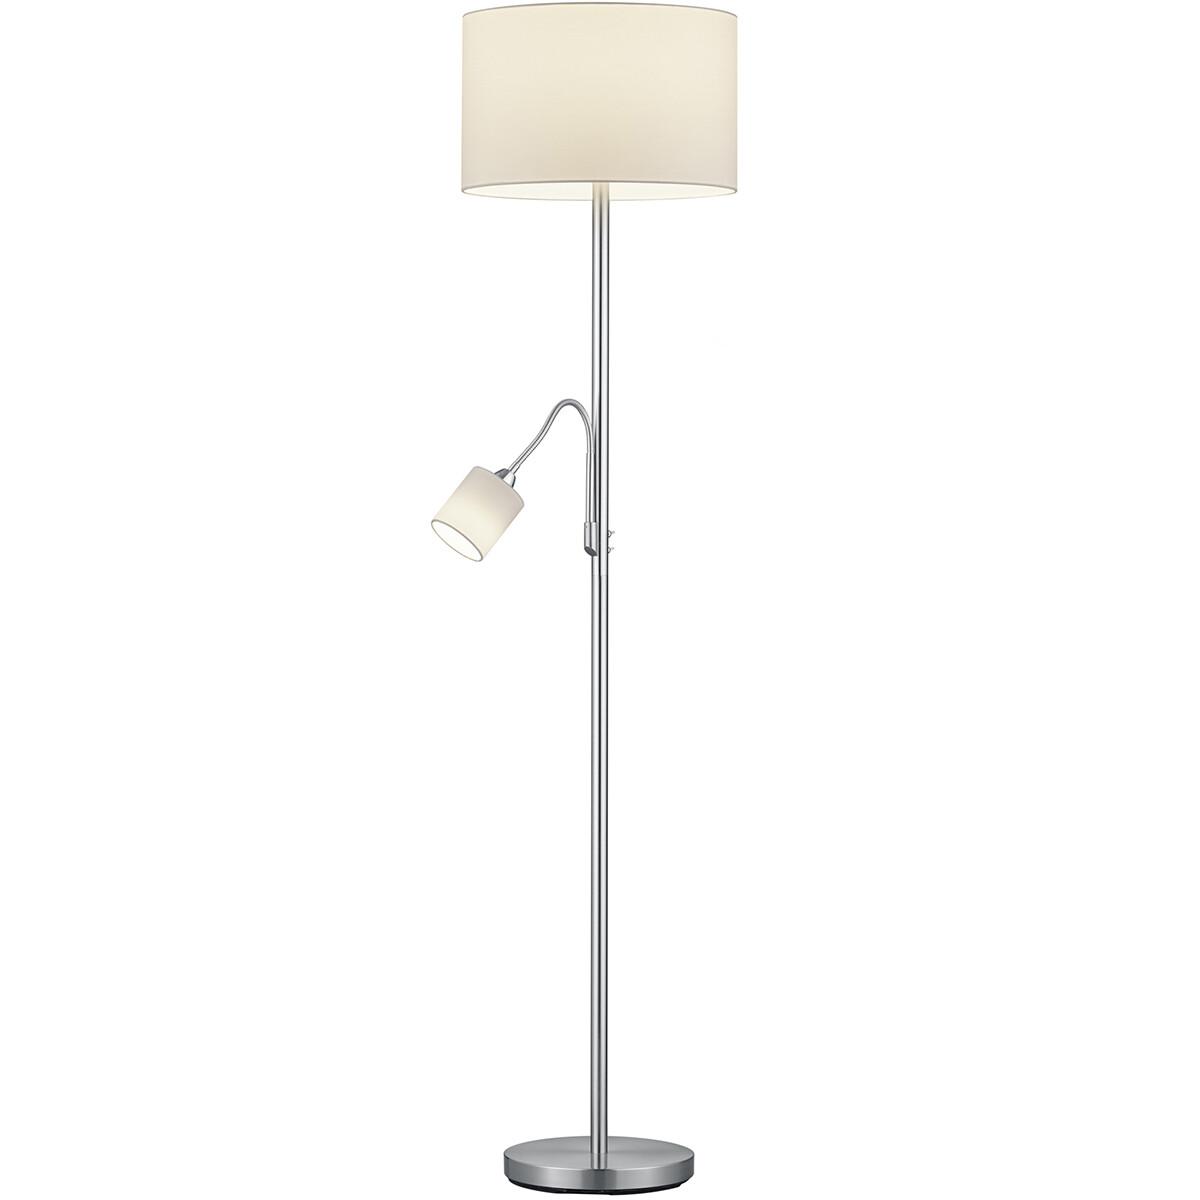 LED Vloerlamp - Trion Hotia - E14 Fitting - Rond - Mat Wit - Aluminium